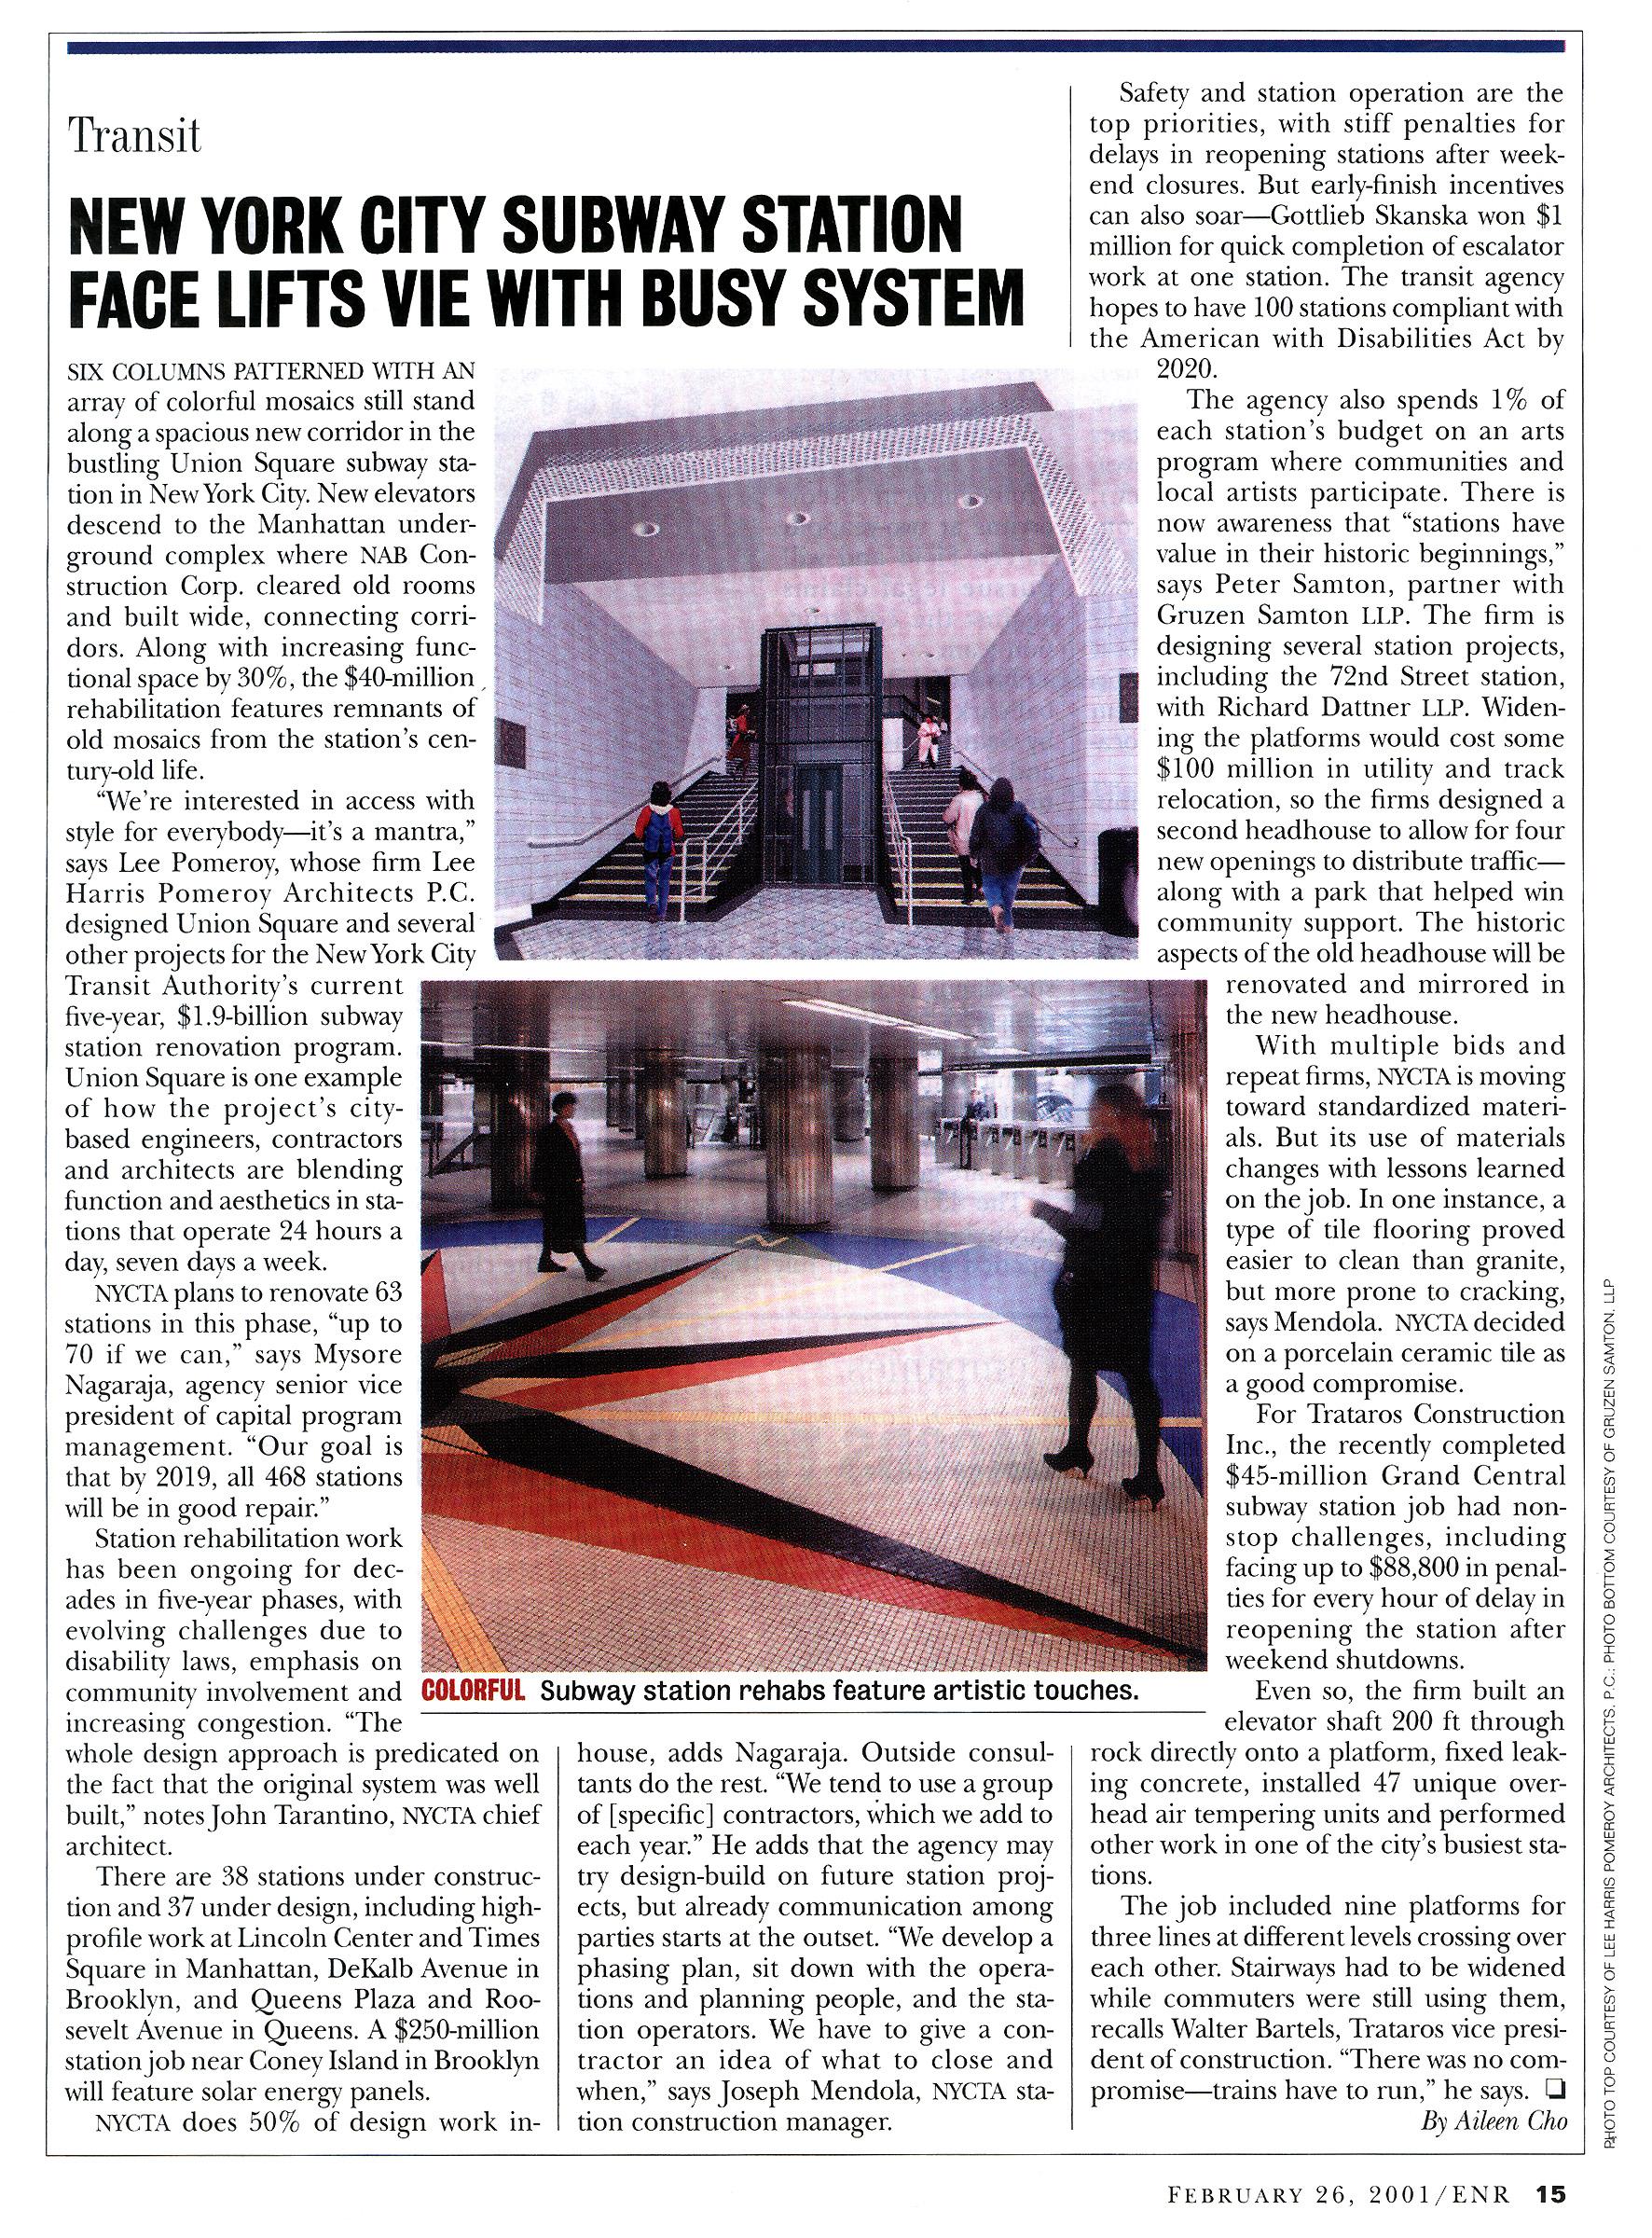 Dekalb Ave ENR Article.jpg